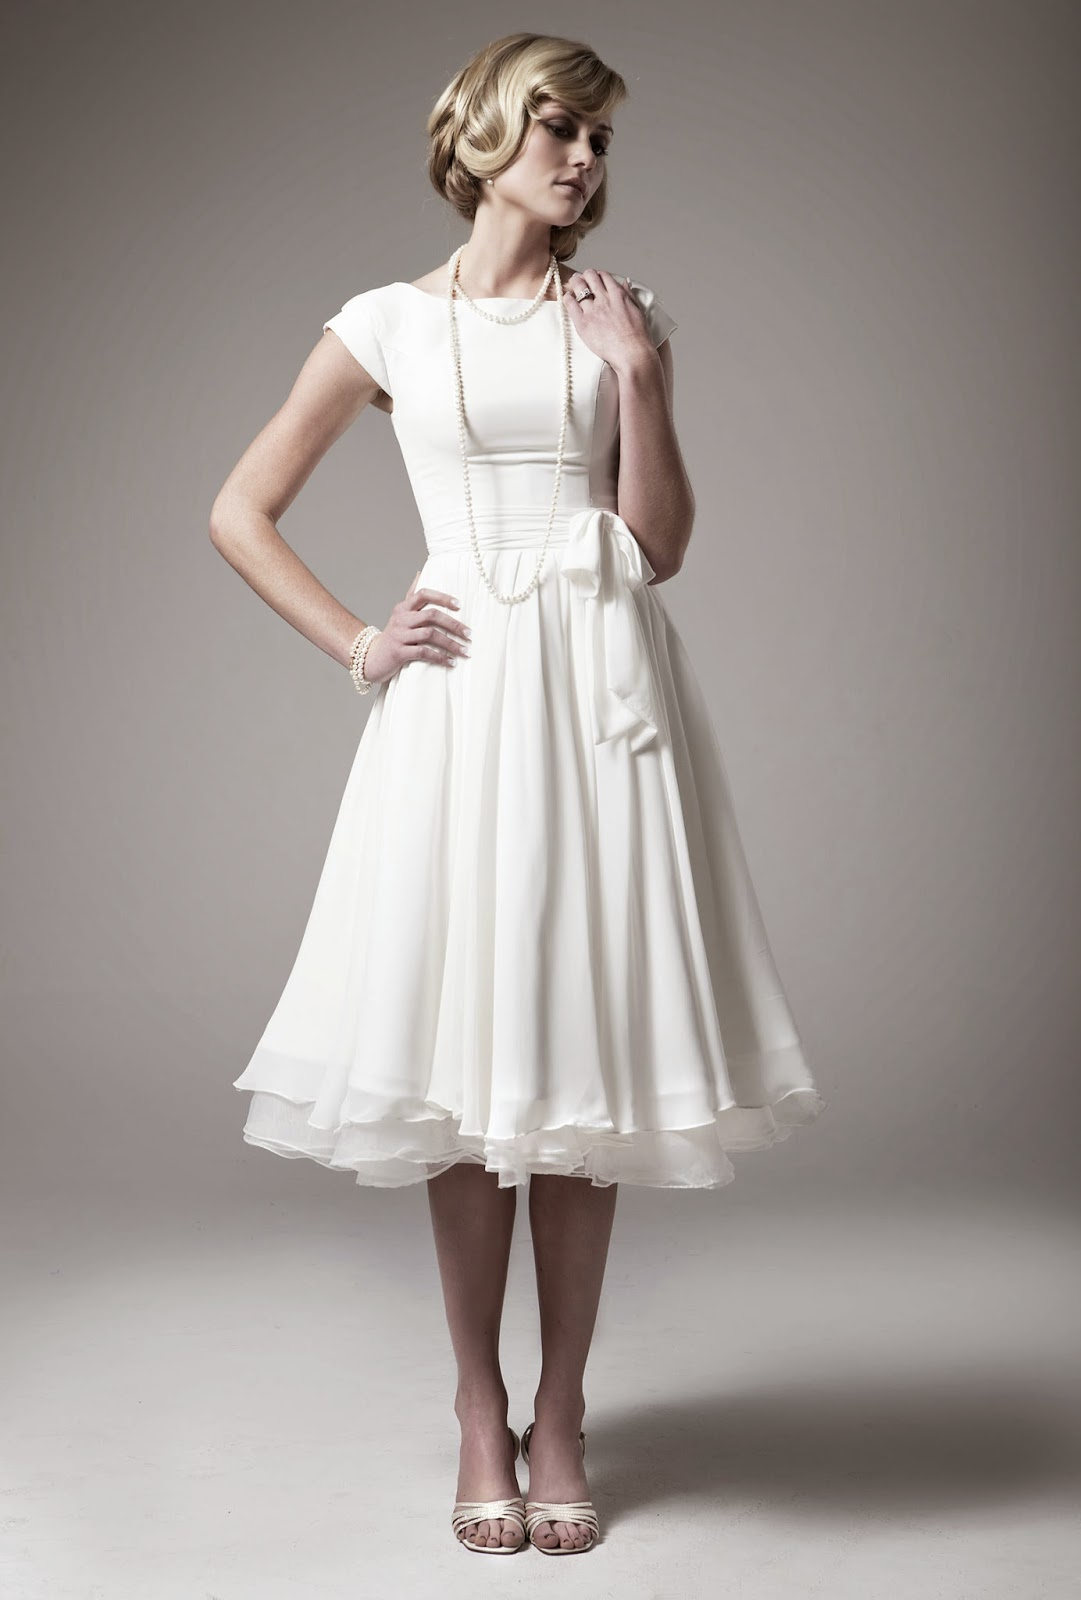 20 Casual Wedding Dresses Ideas